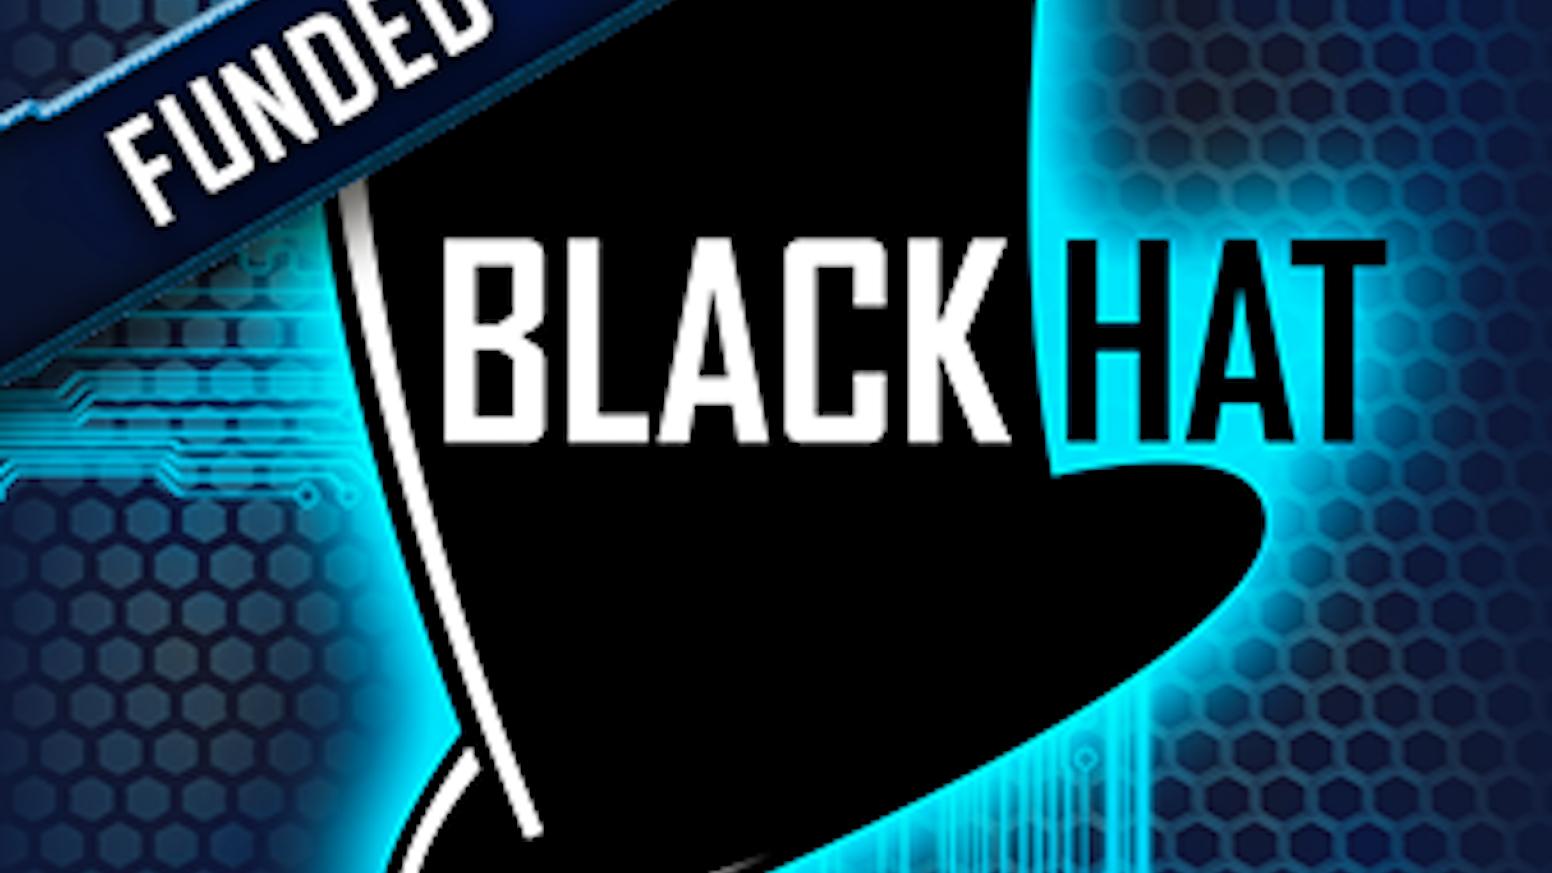 Black Hat - hacker-themed board game - choose tricks to win